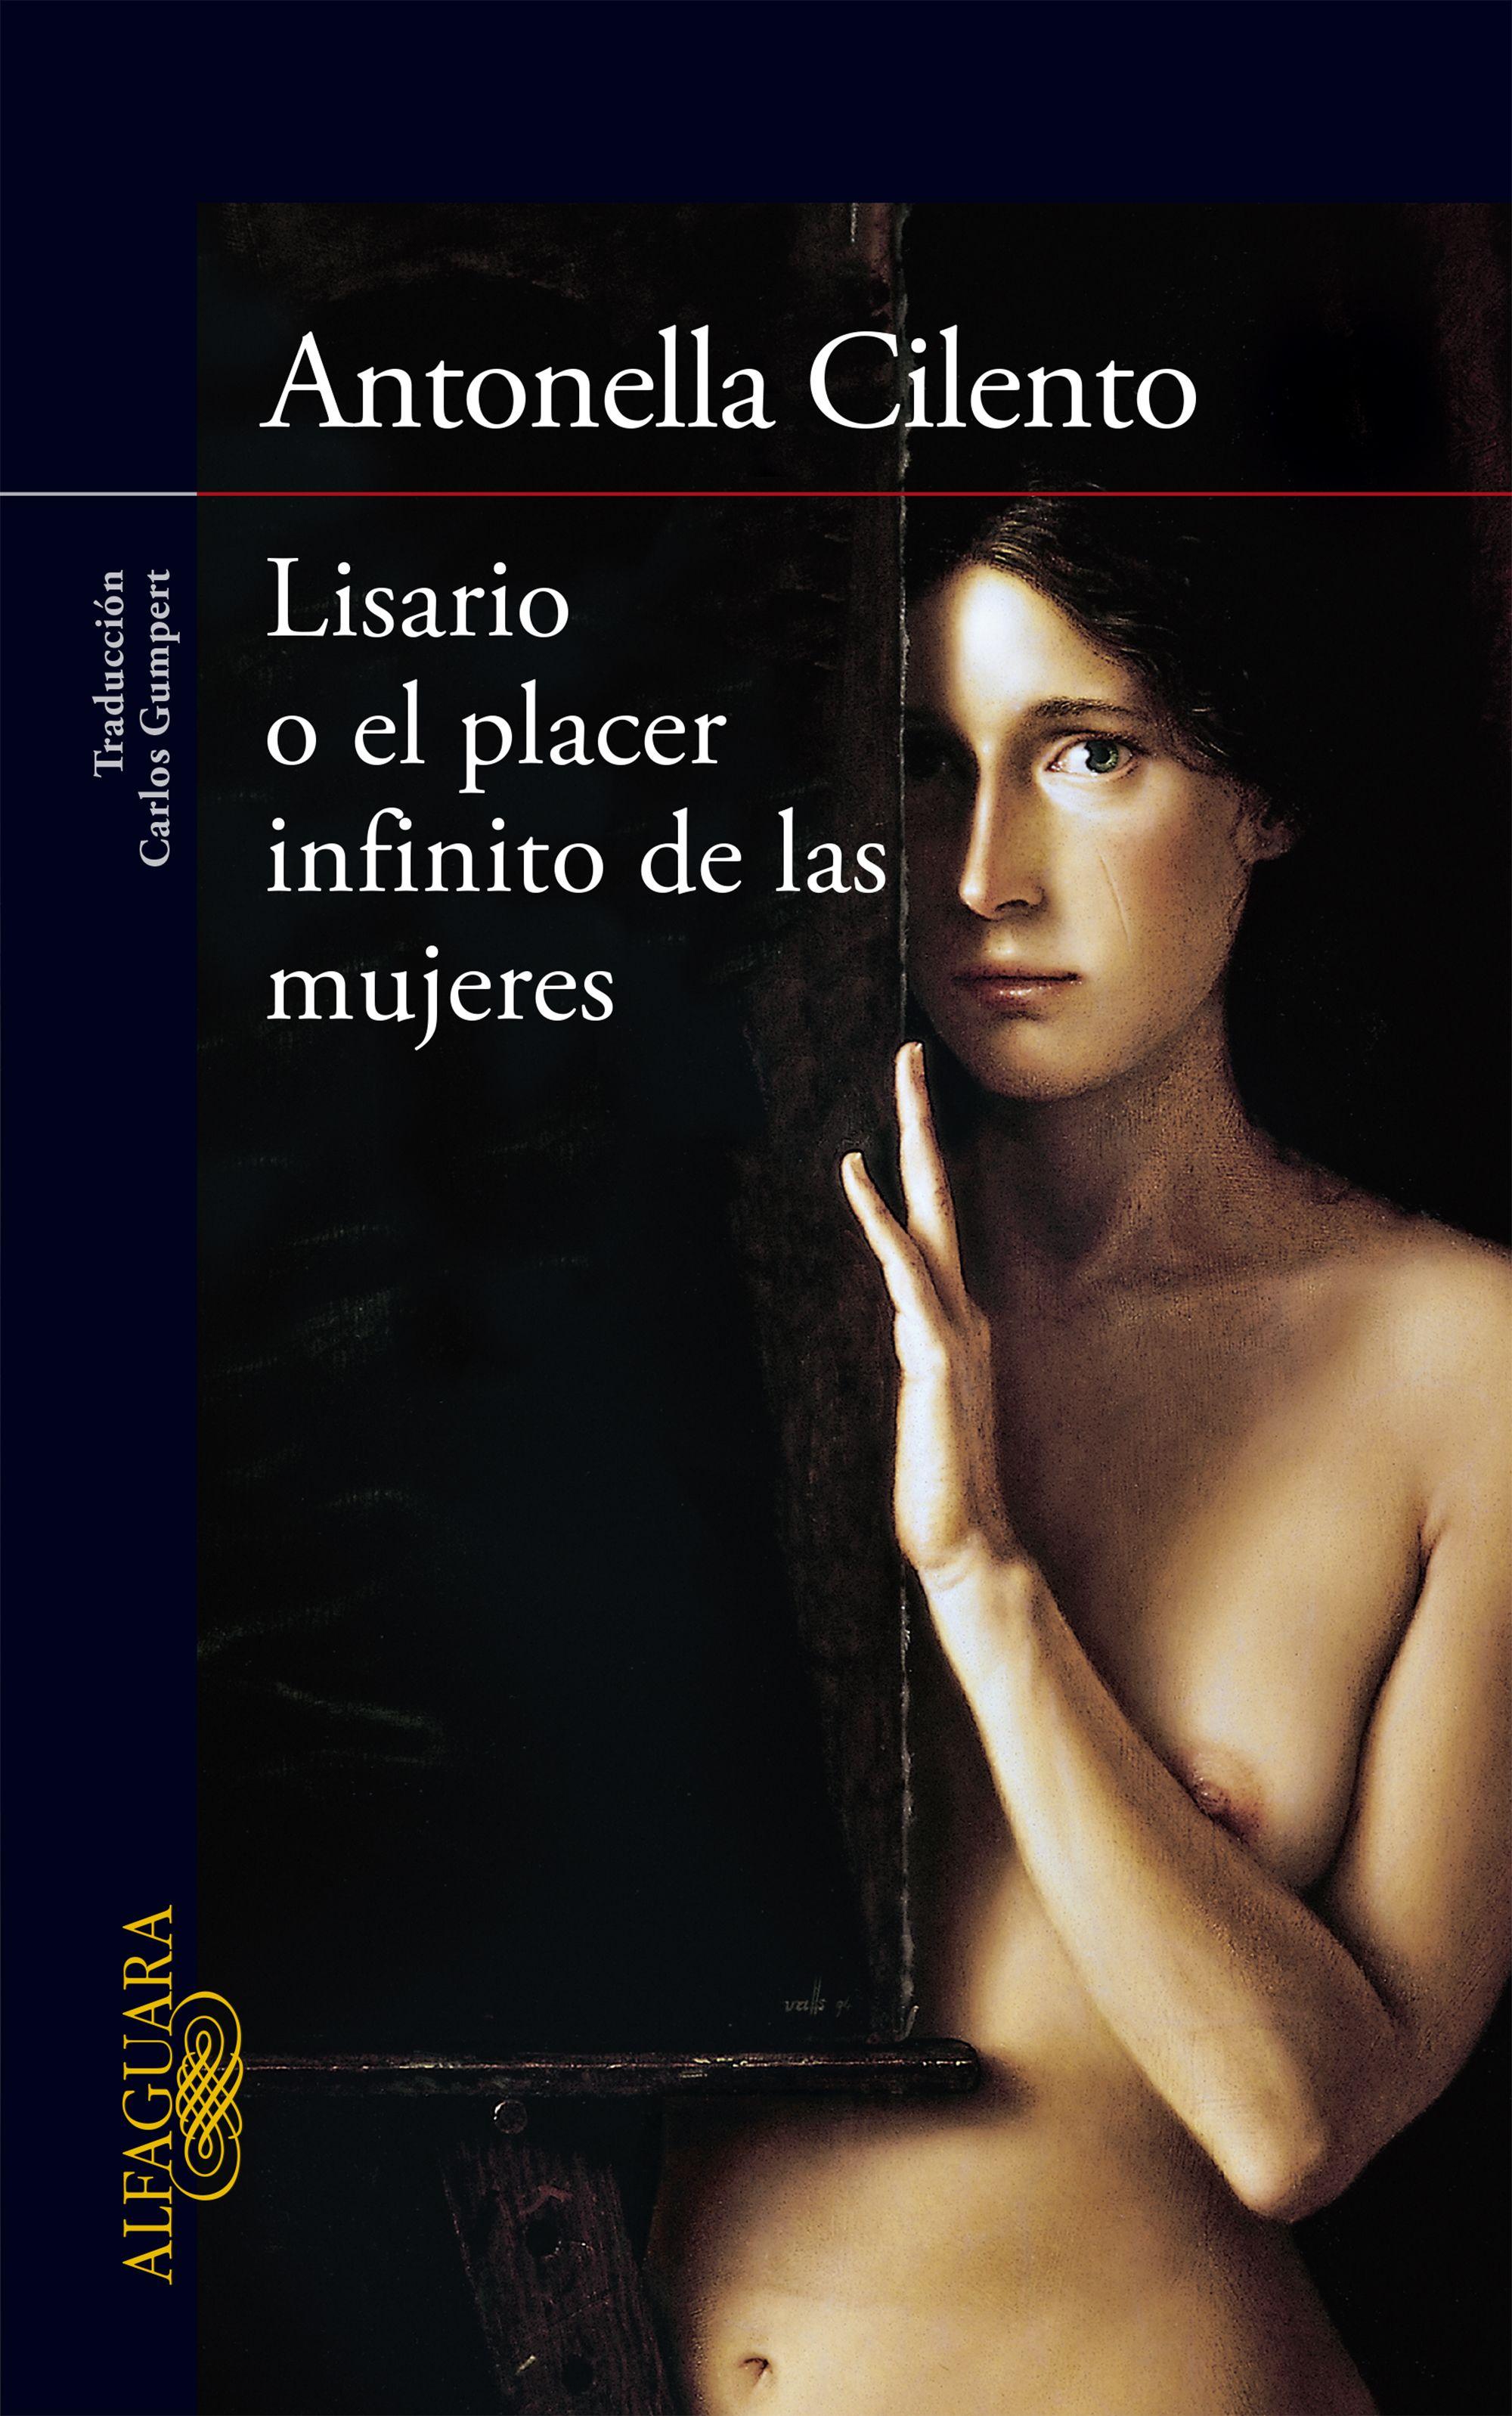 lisario